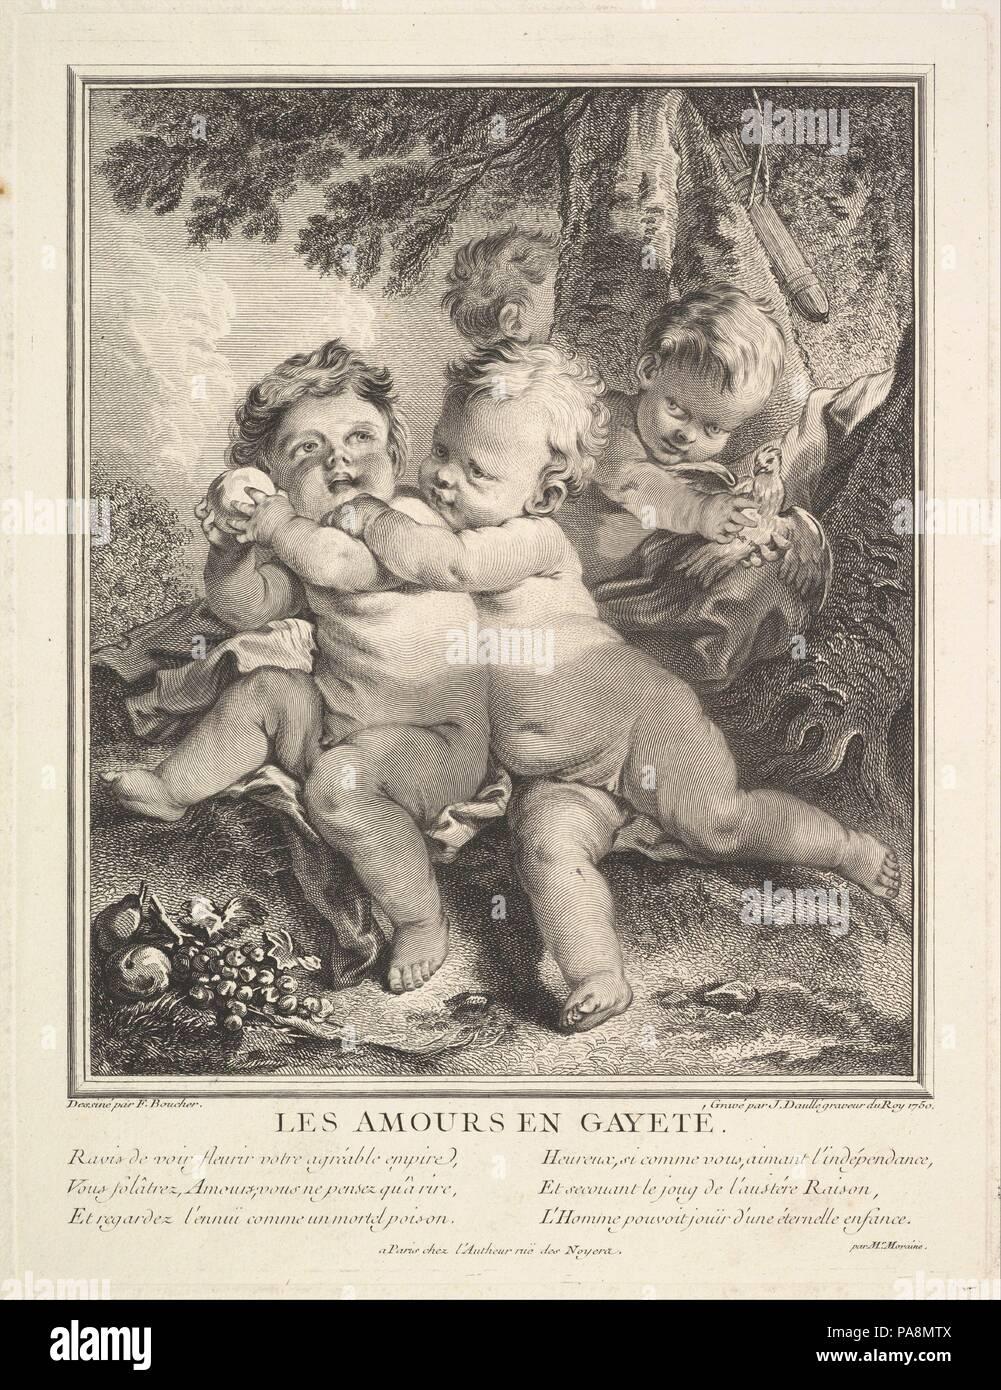 The Cheerful Cupids. Artist: After François Boucher (French, Paris 1703-1770 Paris); Jean Daullé (French, Abbeville 1703-1763 Paris). Dimensions: Plate: 13 1/2 × 10 1/4 in. (34.3 × 26.1 cm)  Sheet: 18 1/8 × 12 3/8 in. (46.1 × 31.5 cm). Date: 1750. Museum: Metropolitan Museum of Art, New York, USA. Stock Photo